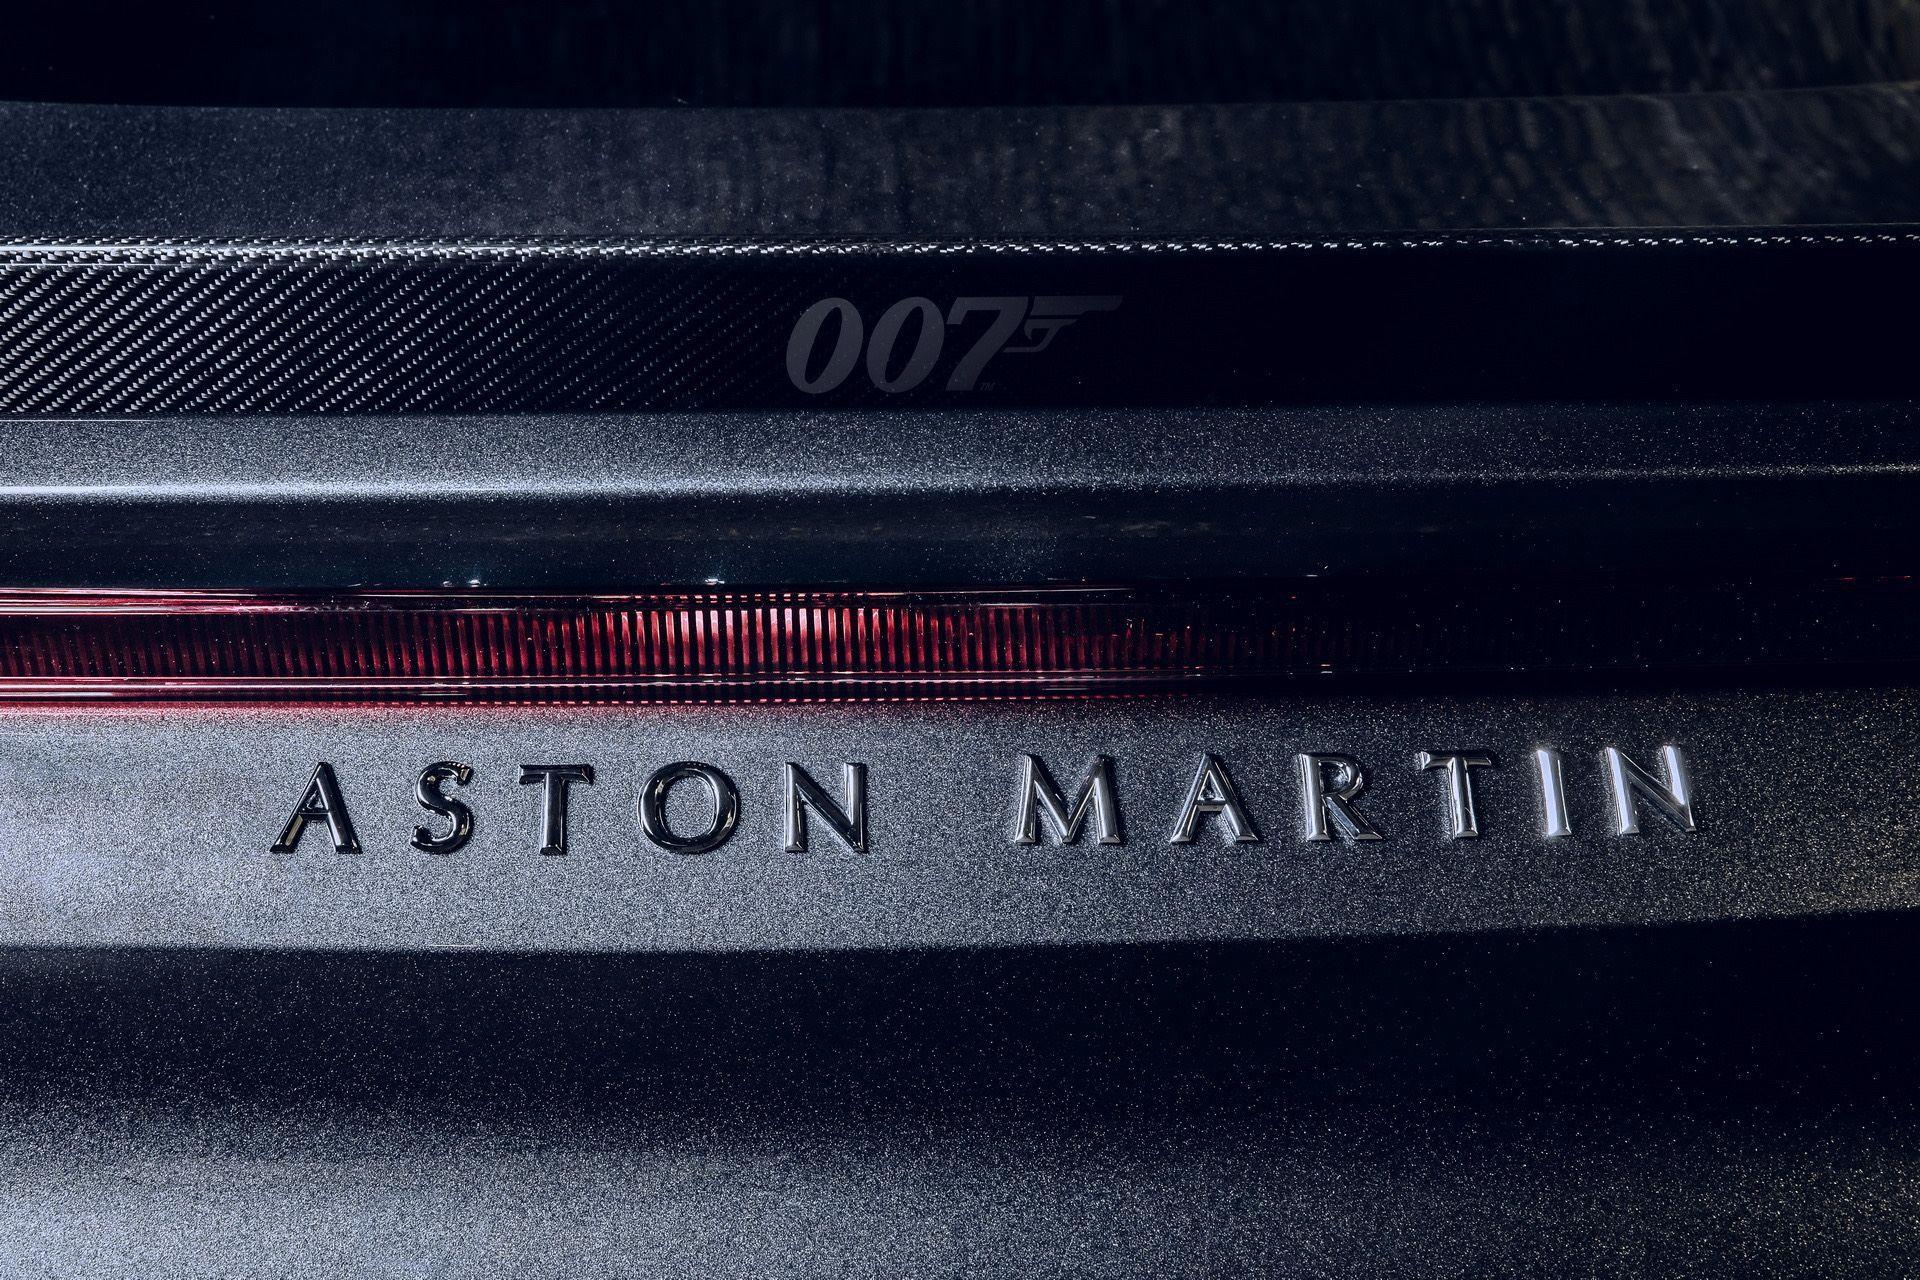 2021-aston-martin-dbs-superleggera-007-edition-6